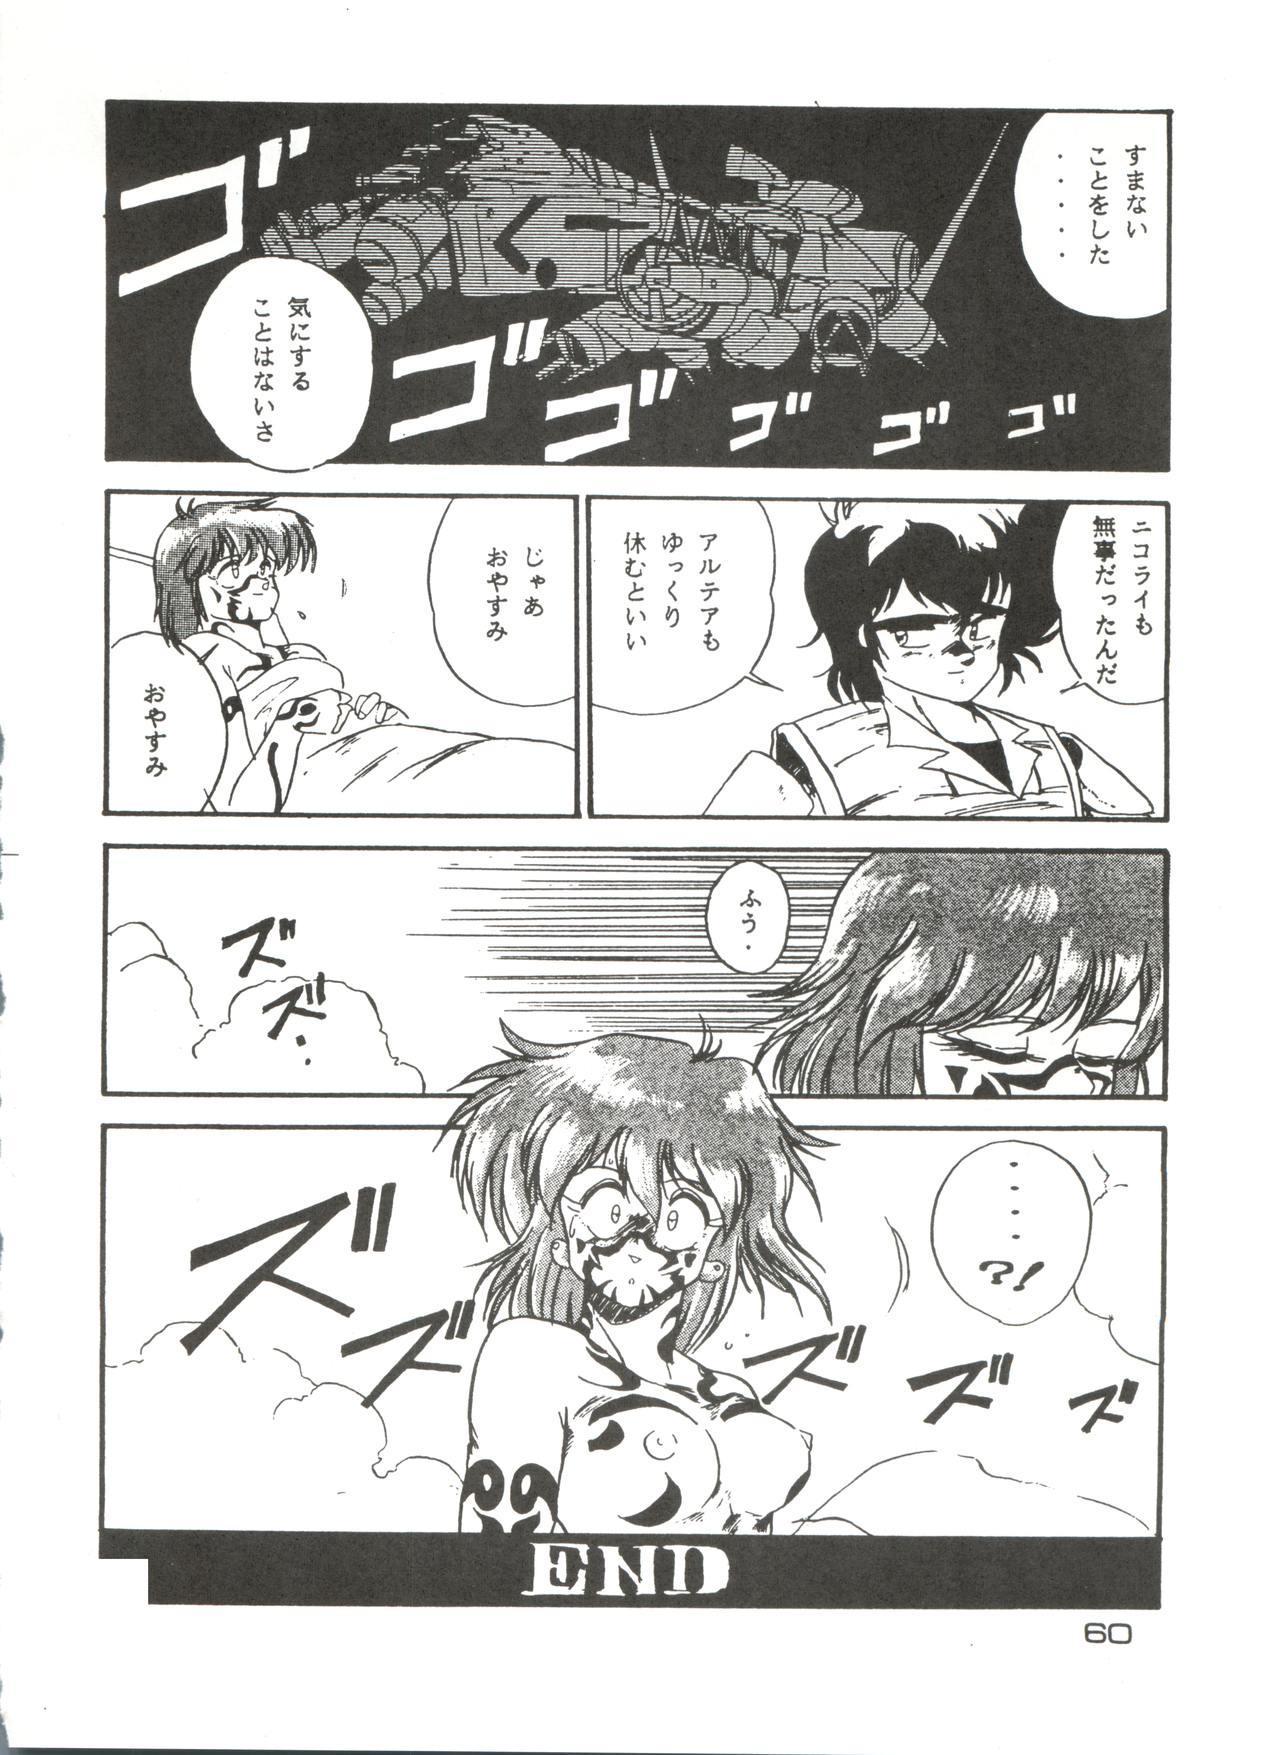 [Studio Fuck (Various) Onapet 7 (Sonic Soldier Borgman, Gundam ZZ, Osomatsu-kun) 59